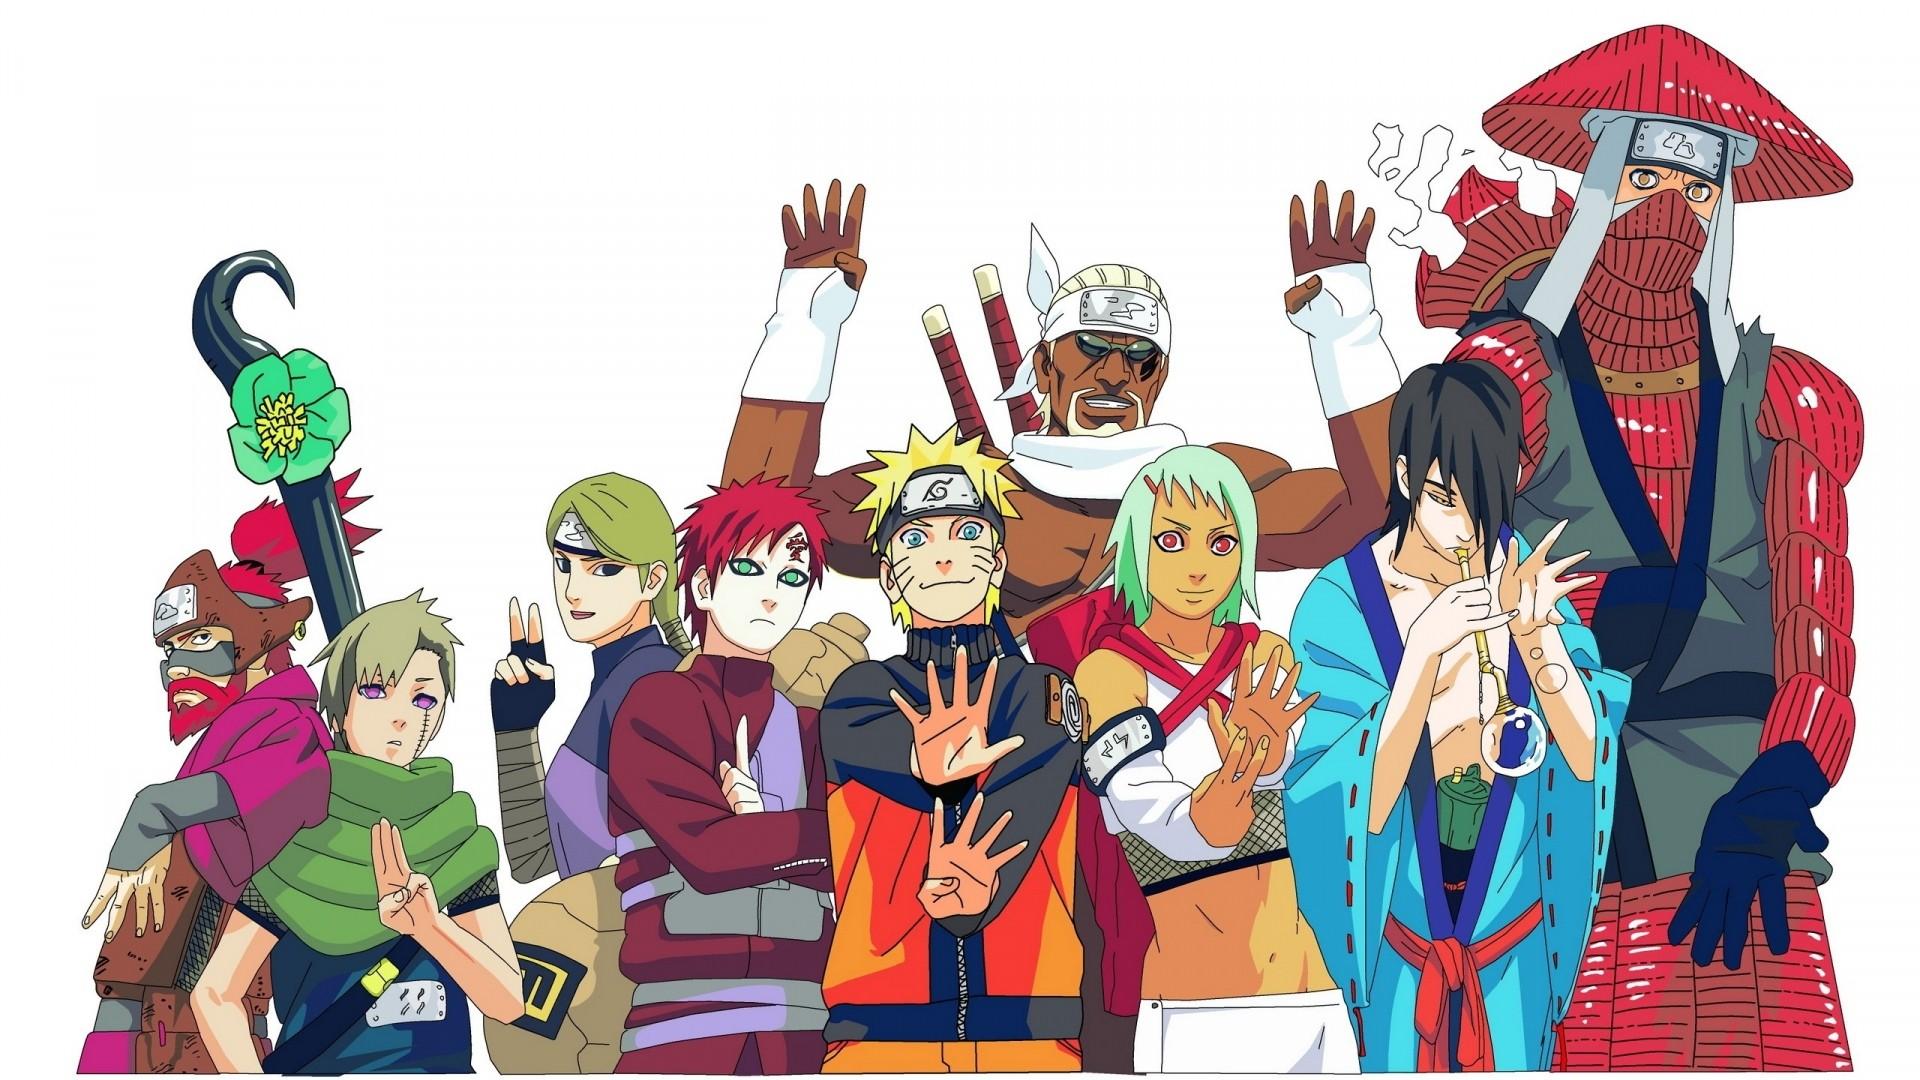 Anime Wallpaper Naruto Uzumaki Shippuden Wallpaper High Quality